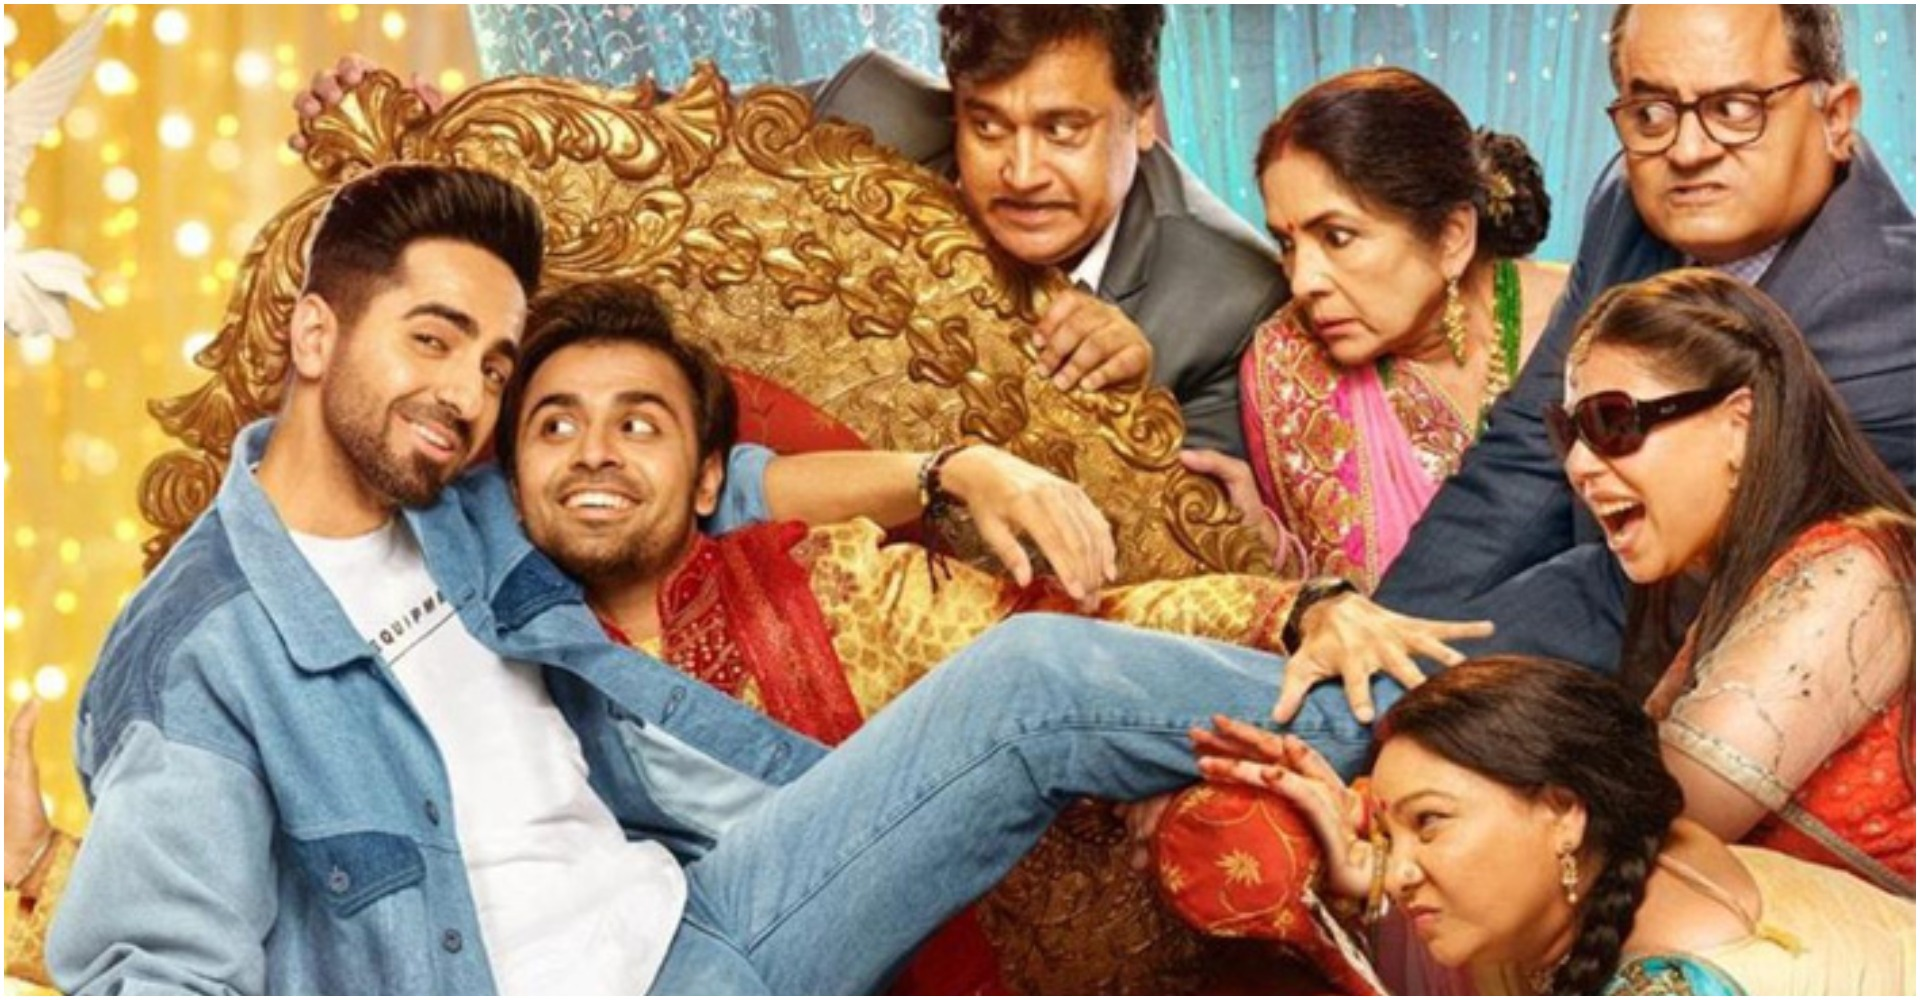 Shubh Mangal Jyada Saavdhan Box Office: आयुष्मान खुराना की फिल्म का बॉक्स ऑफिस कलेक्शन भी रहा 'ज्यादा'